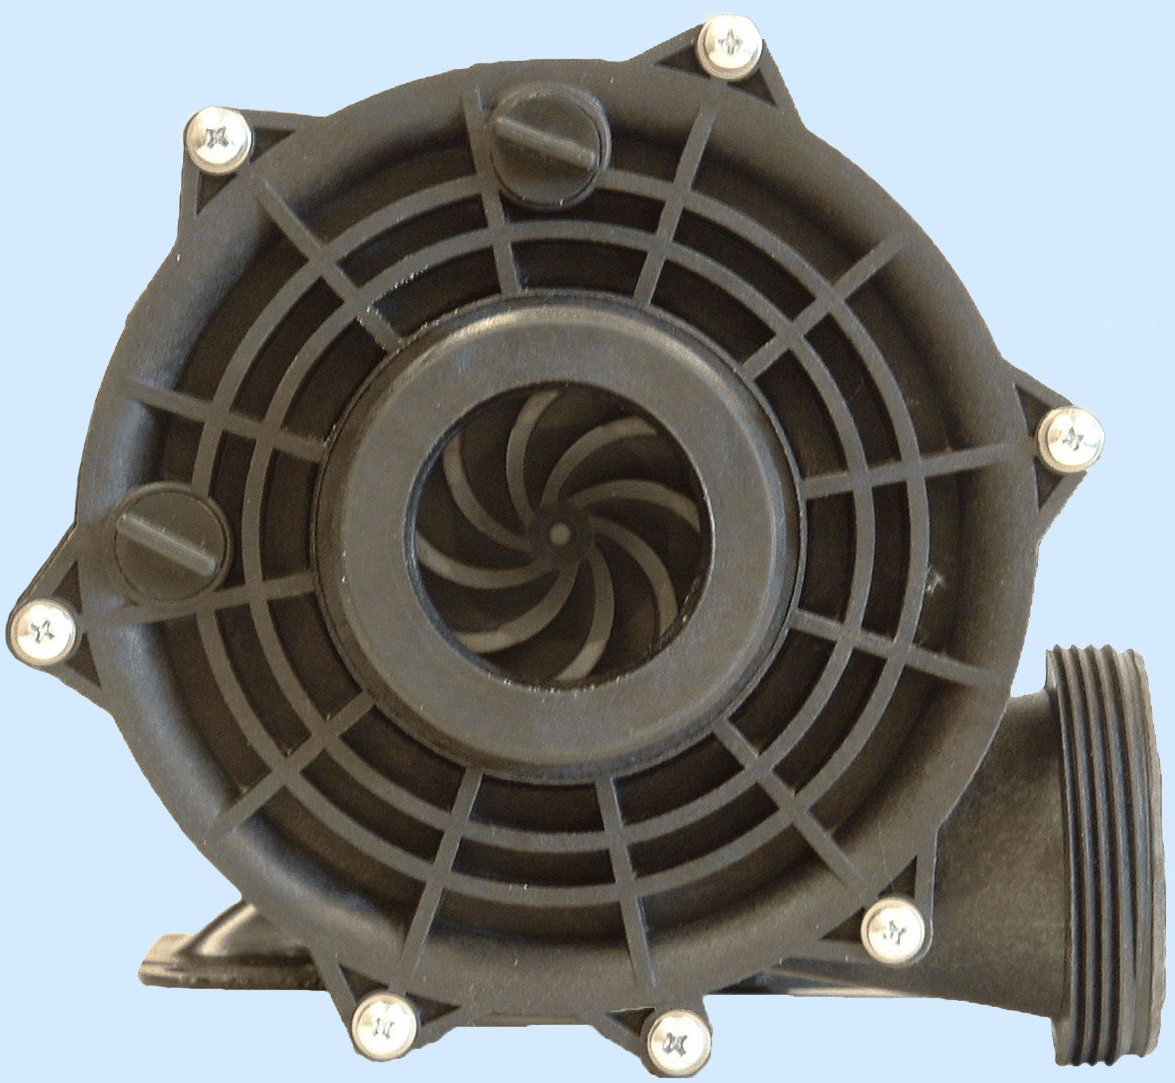 cal spa pump wiring diagram tao 110 atv pack get free image about